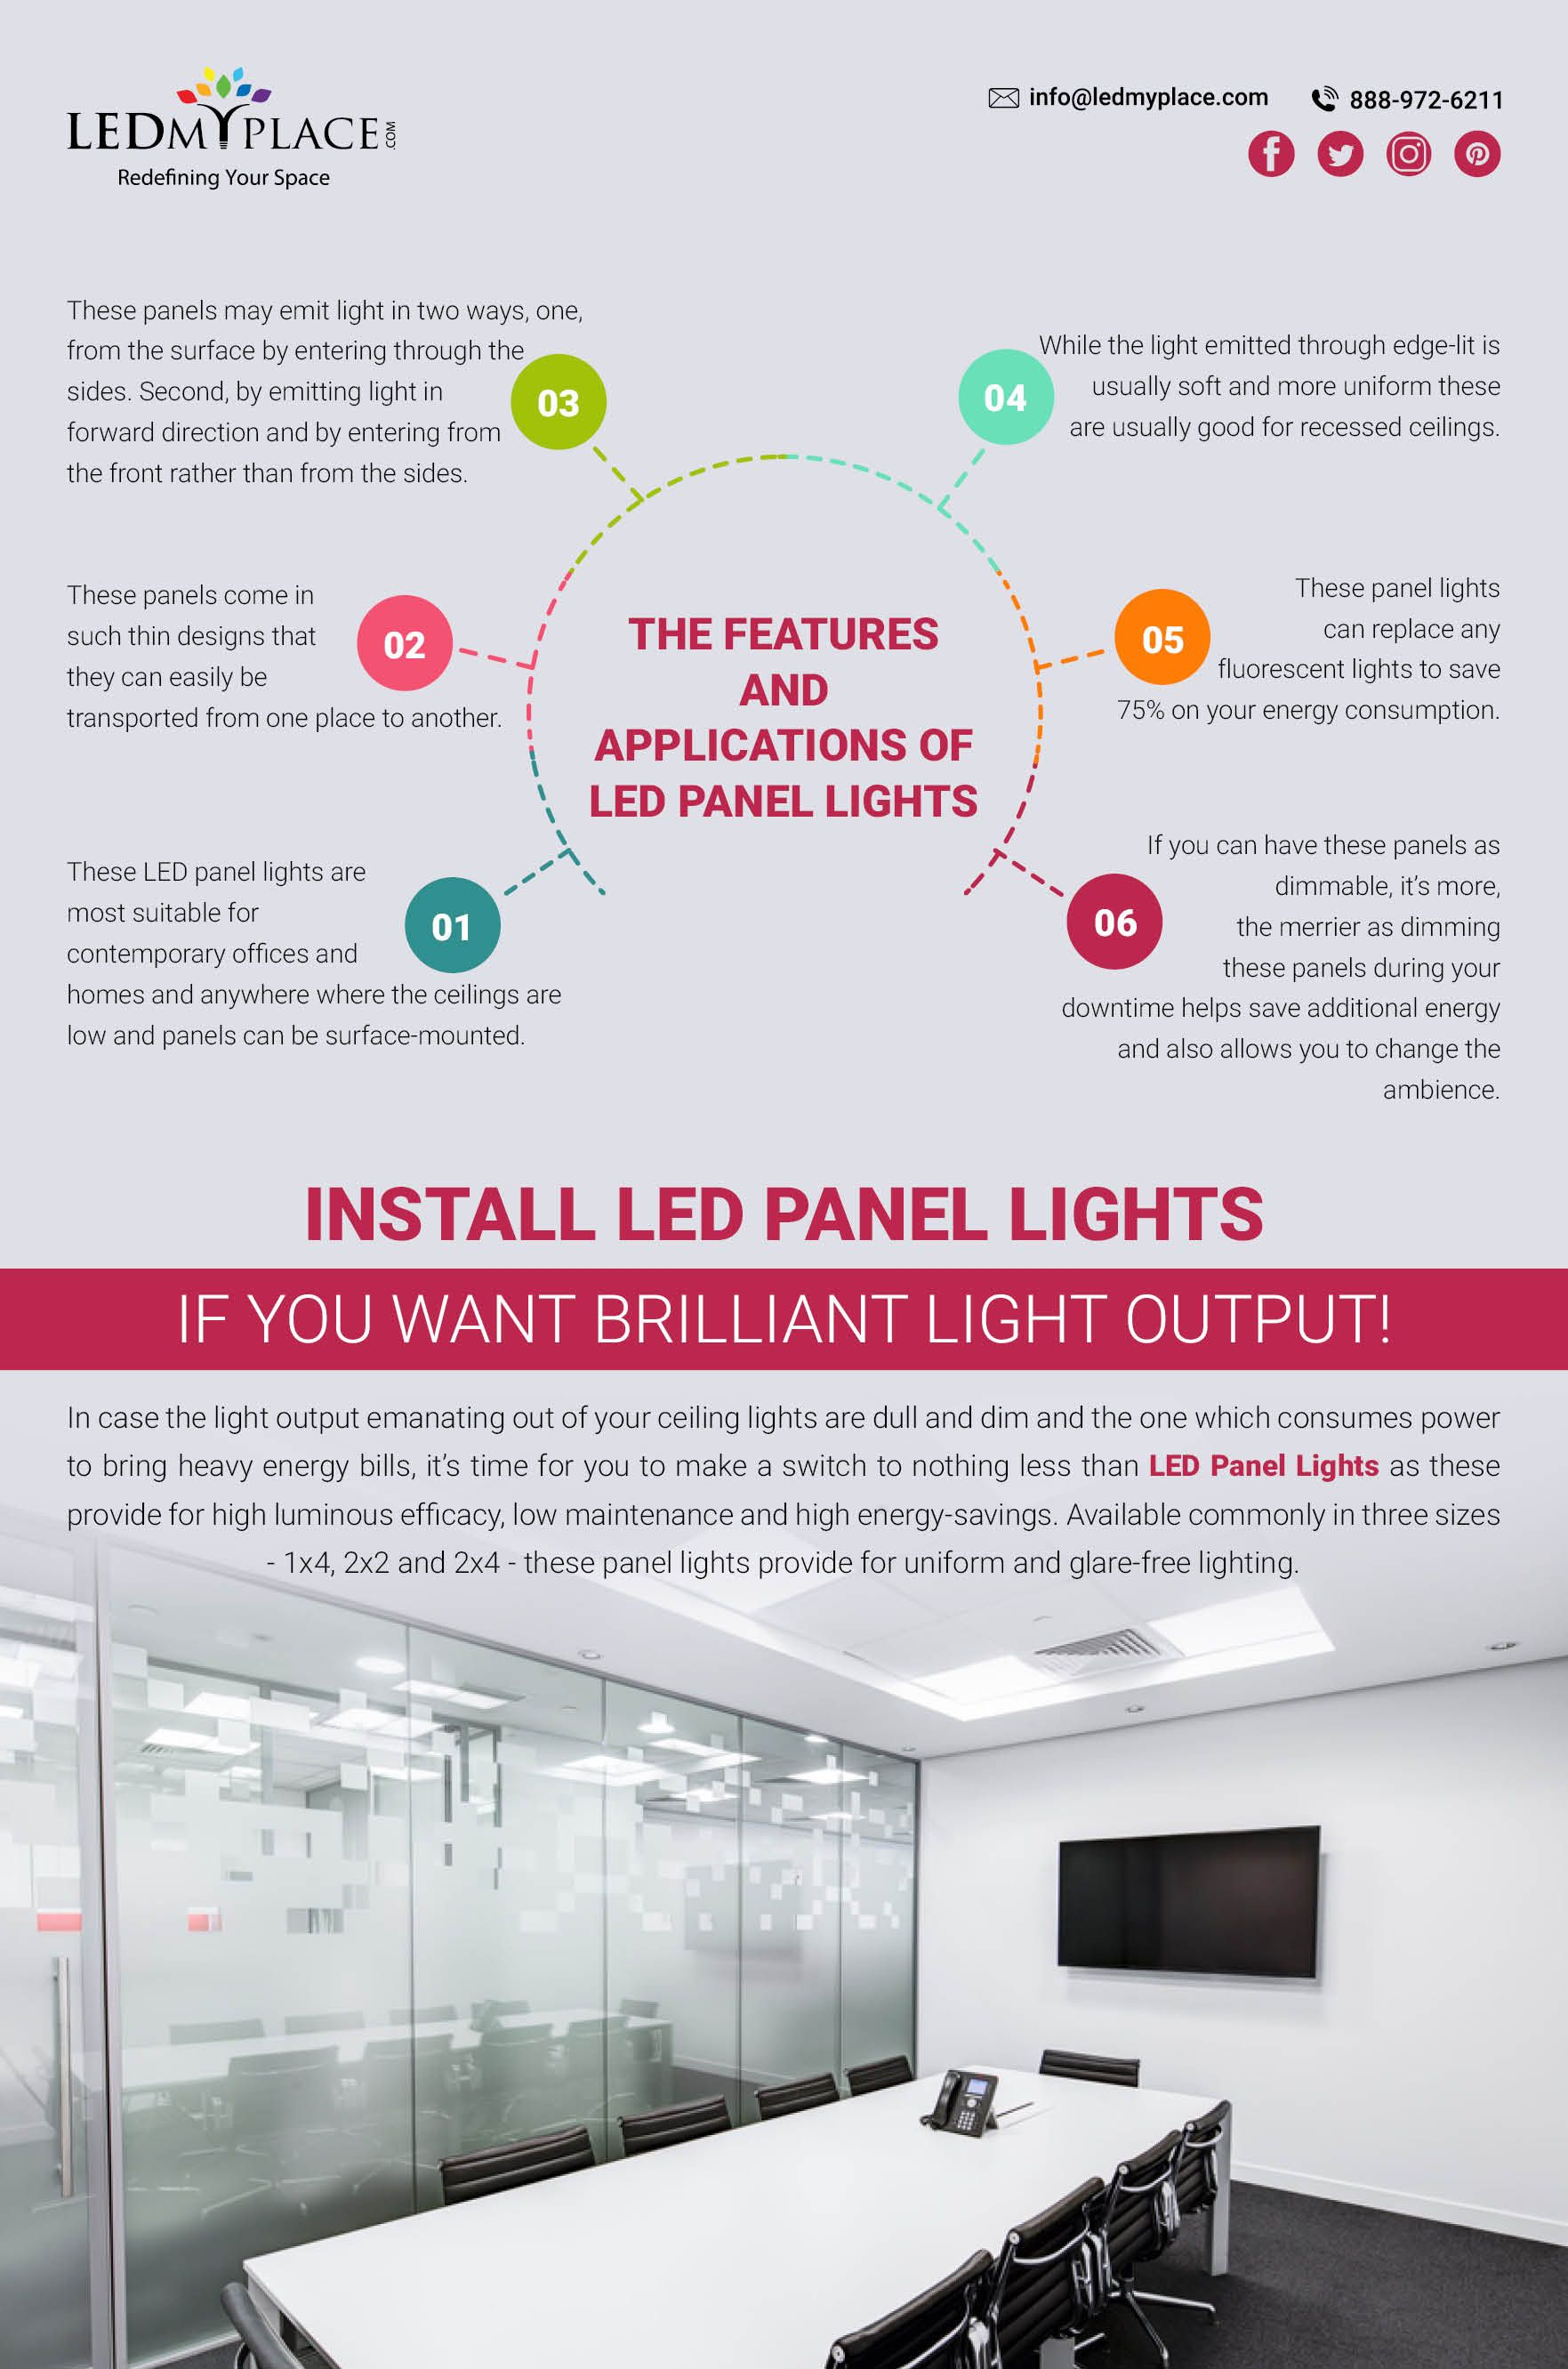 Led Panel Lights Led Panel Led Panel Light Led Indoor Lighting